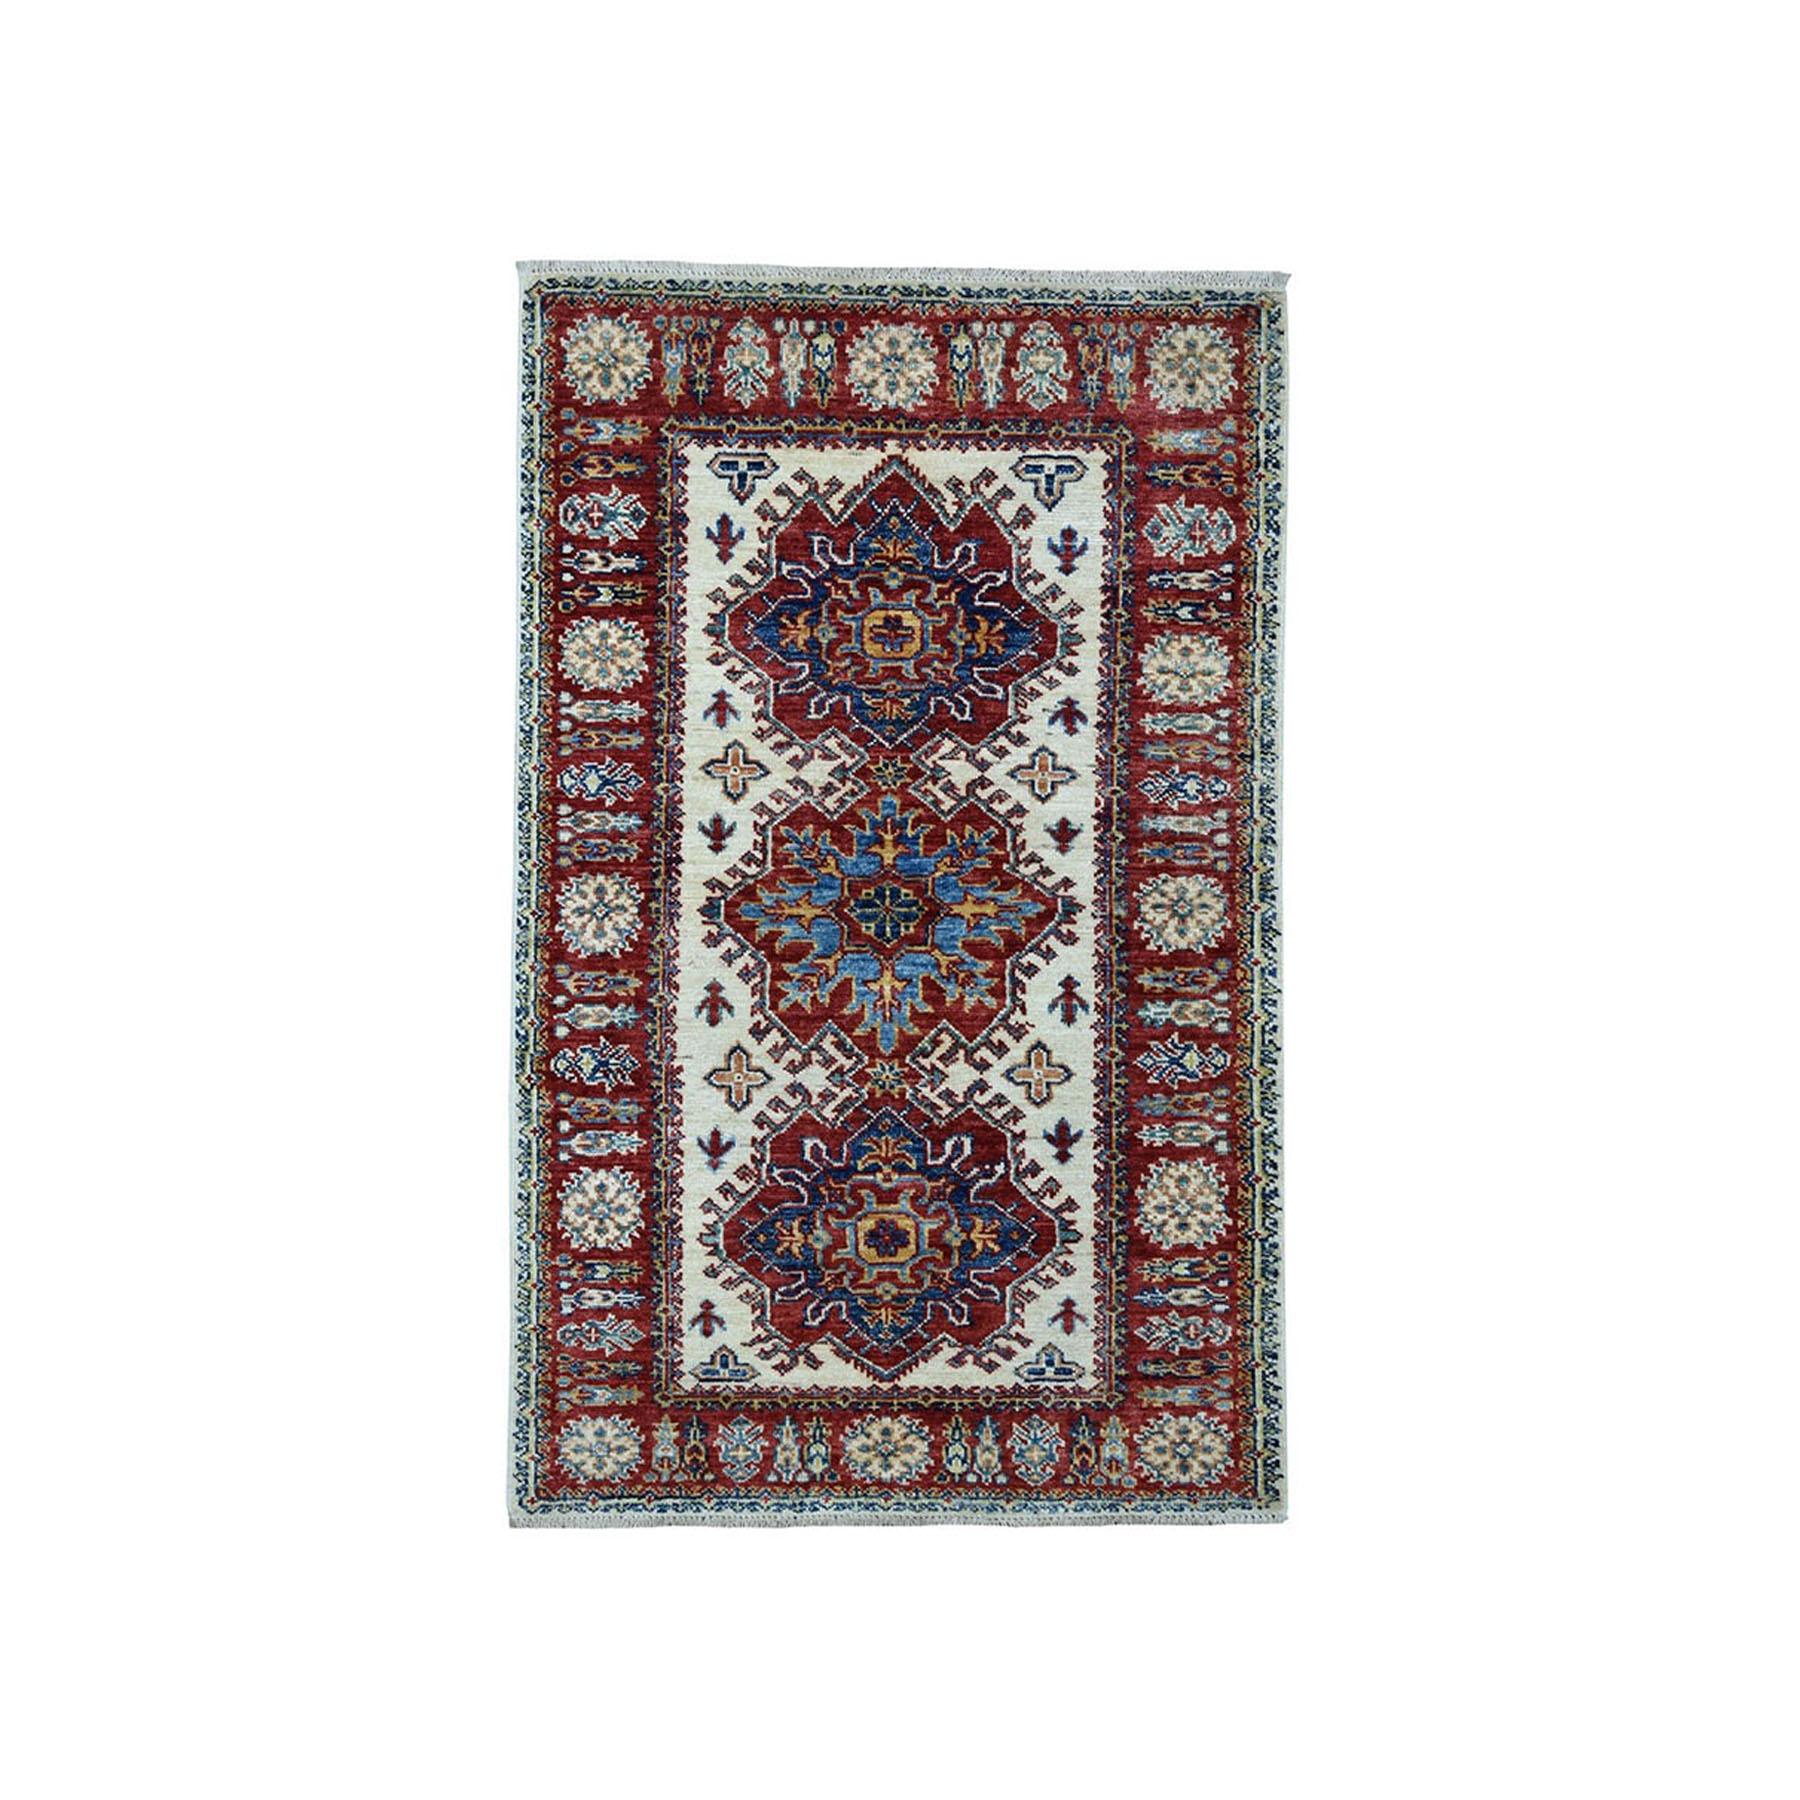 "2'9""X4'6"" Ivory Super Kazak Pure Wool Geometric Design Hand-Knotted Oriental Rug moaea08b"